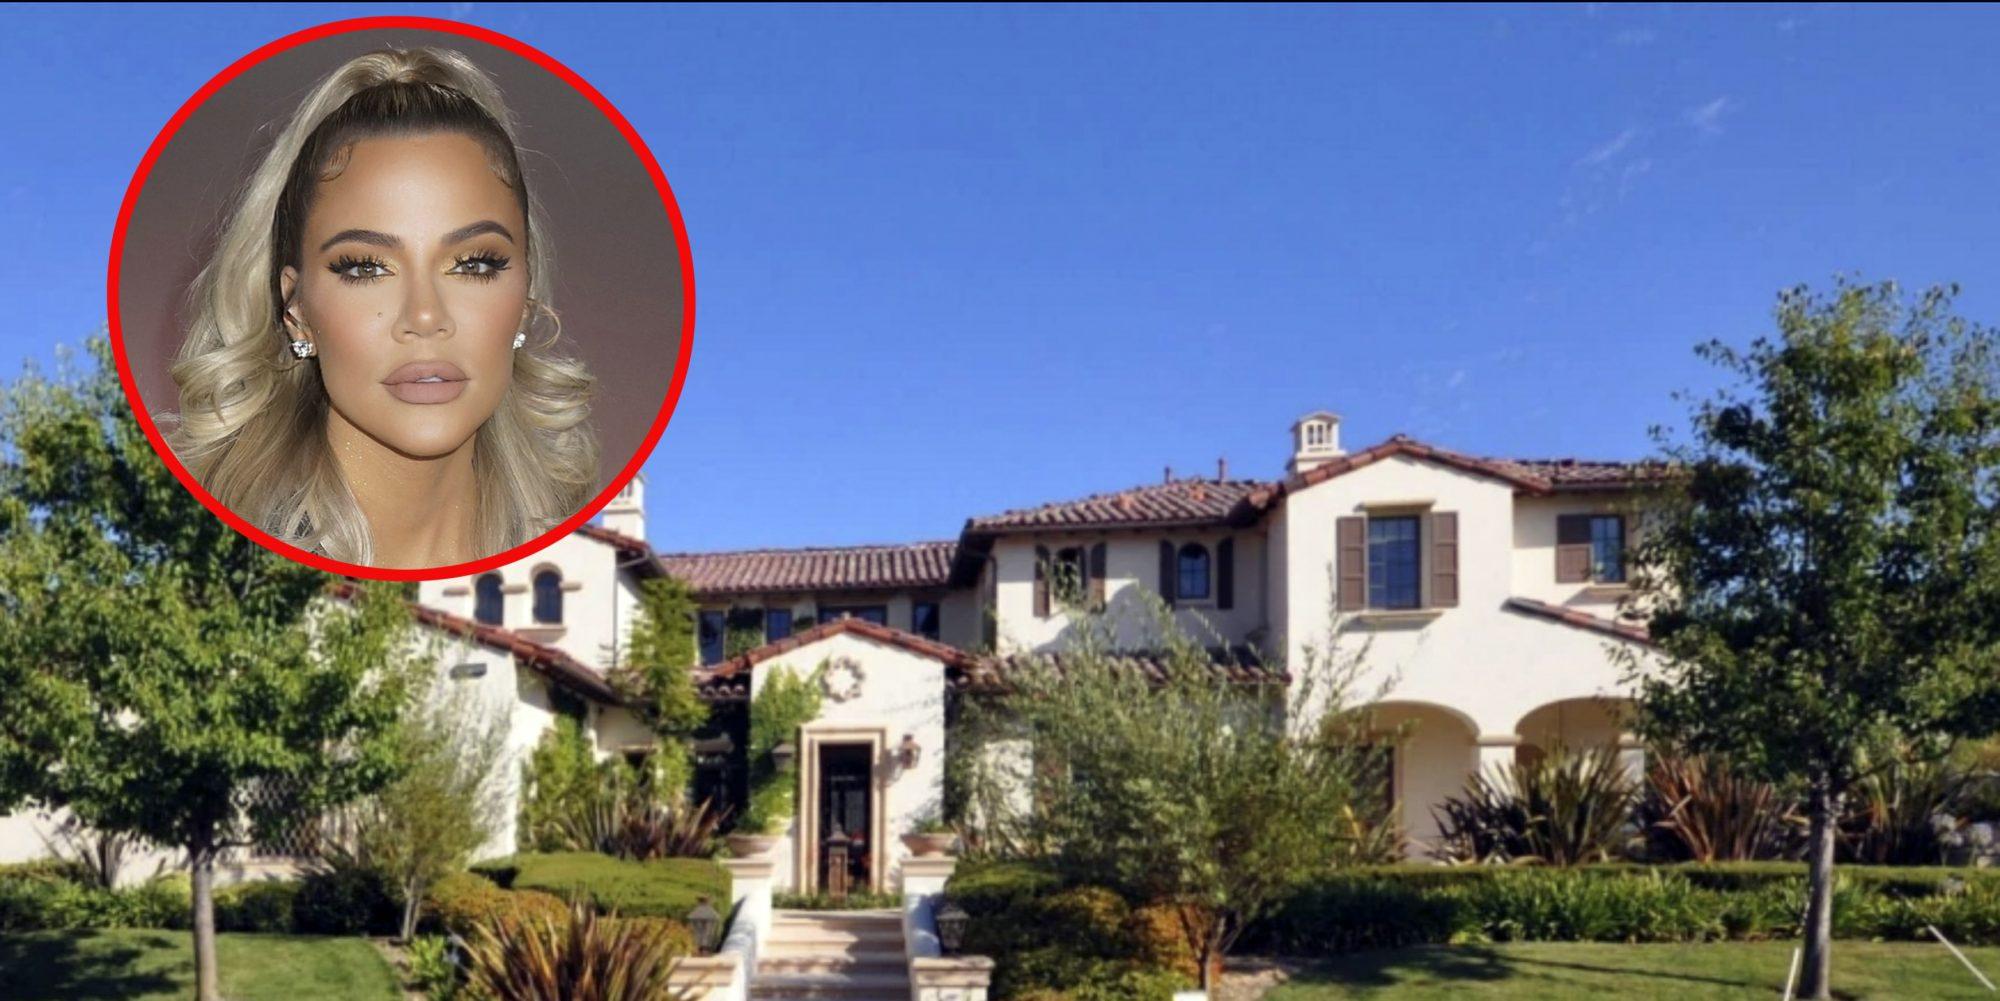 La casa de Khloé Kardashian